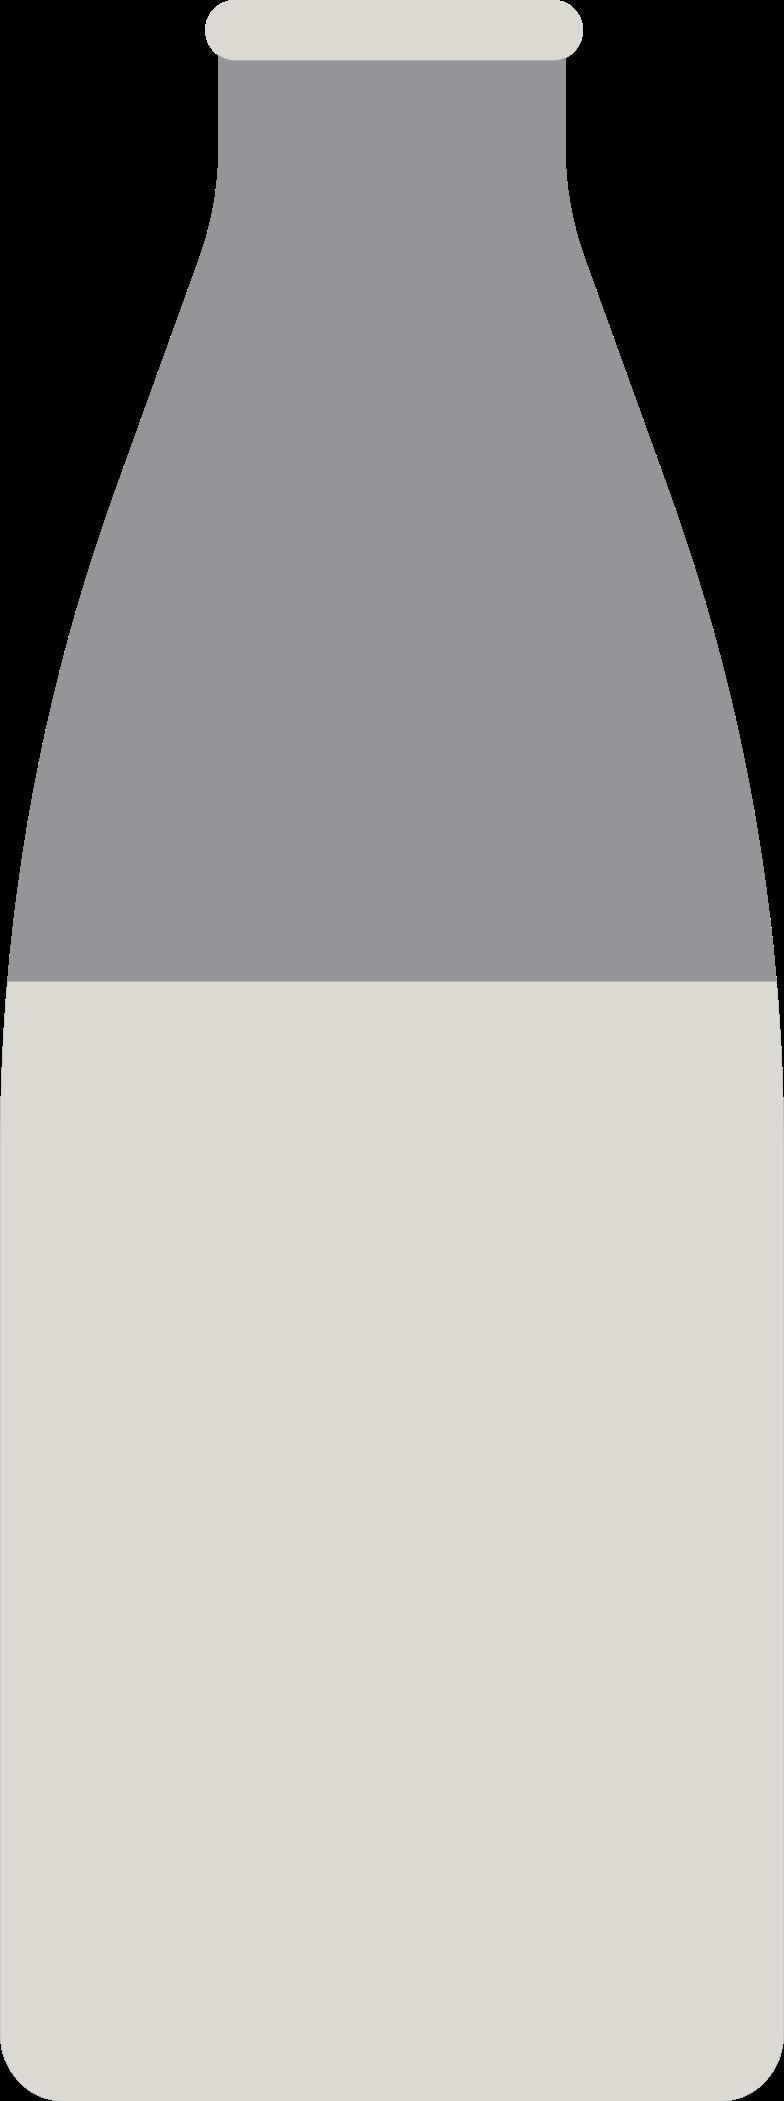 milk carton Clipart illustration in PNG, SVG